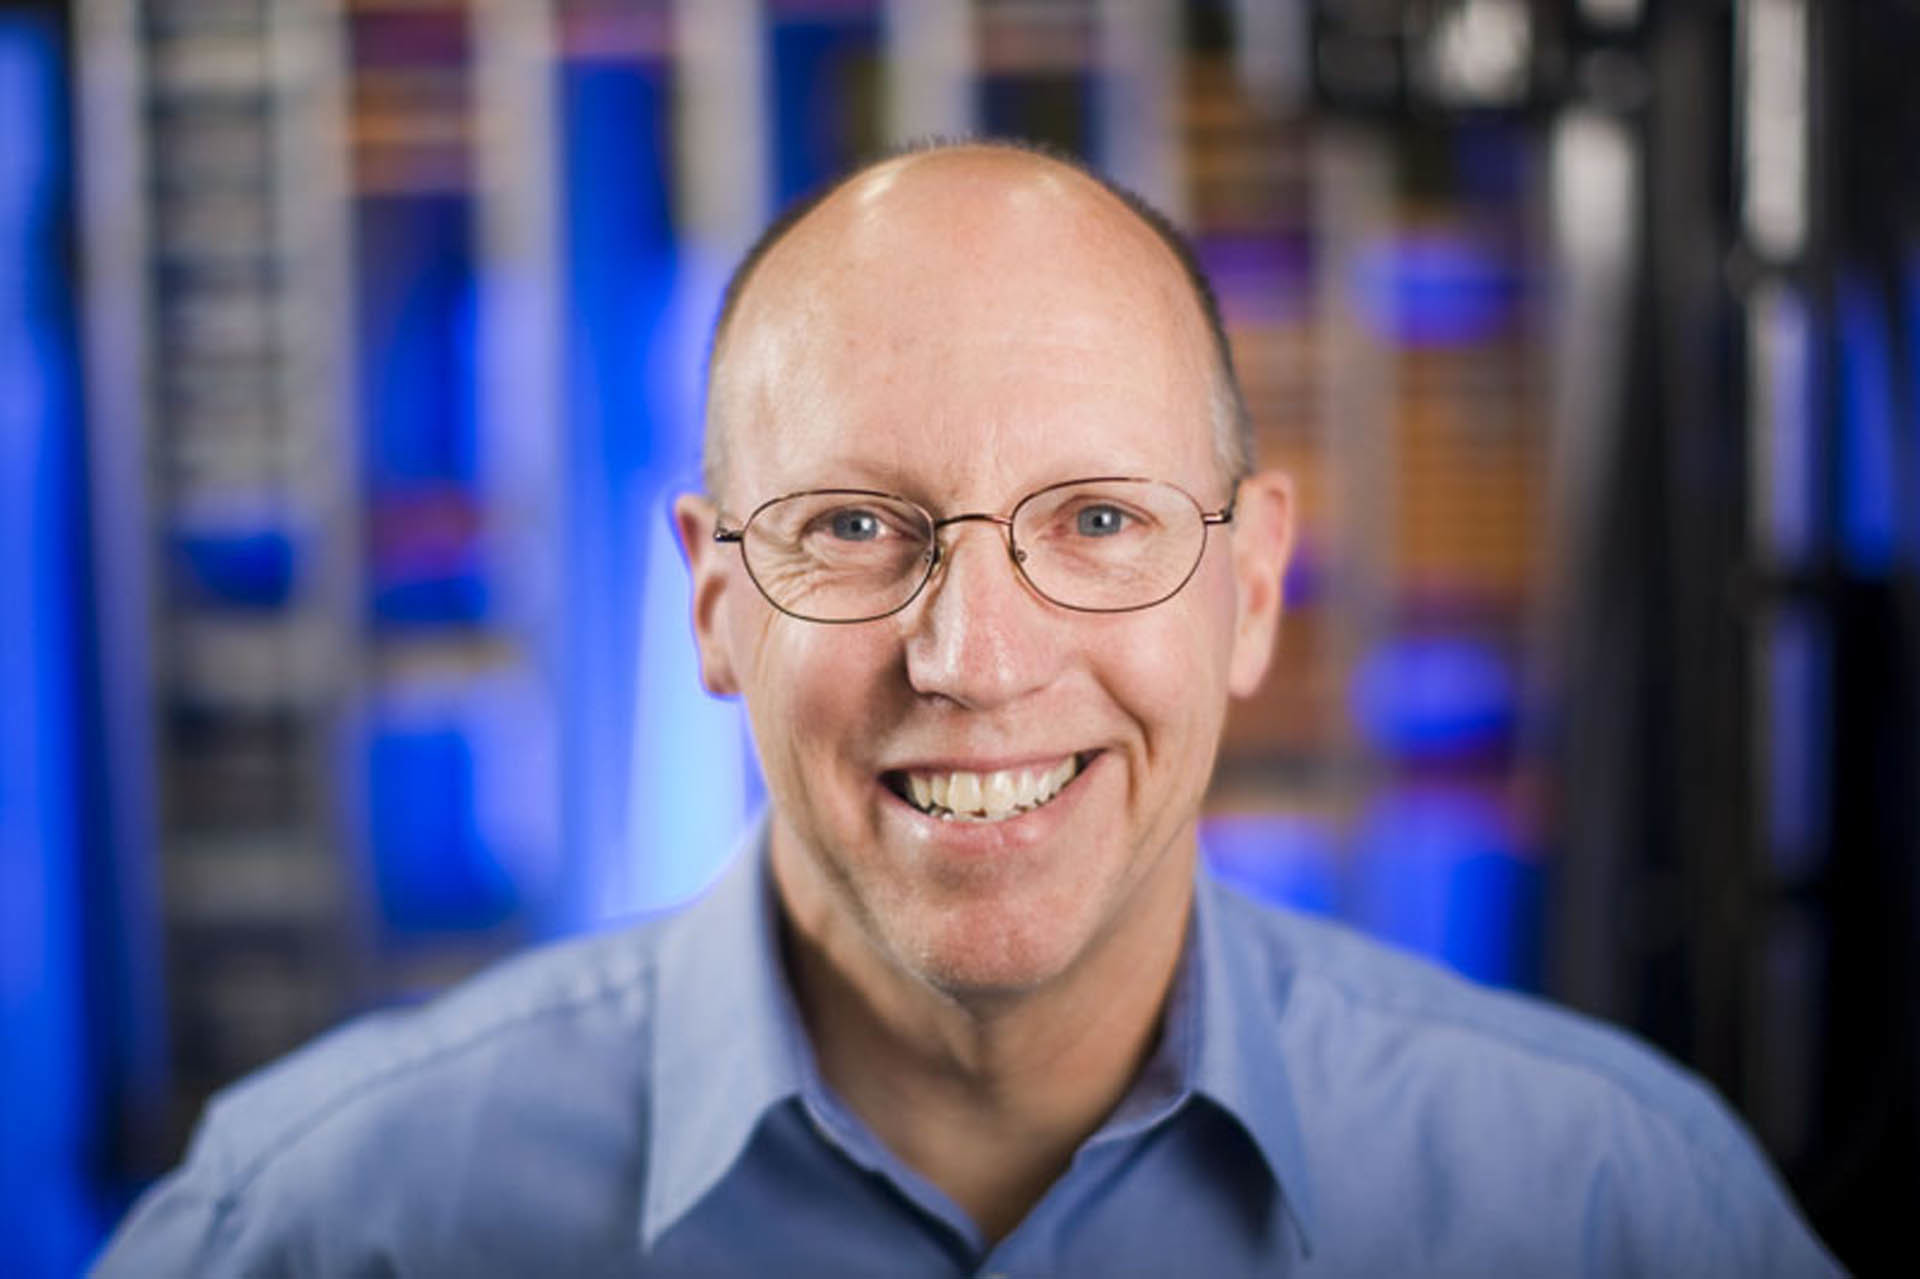 John Lilling, CEO of Nexus Biosystems in Poway, Calif.